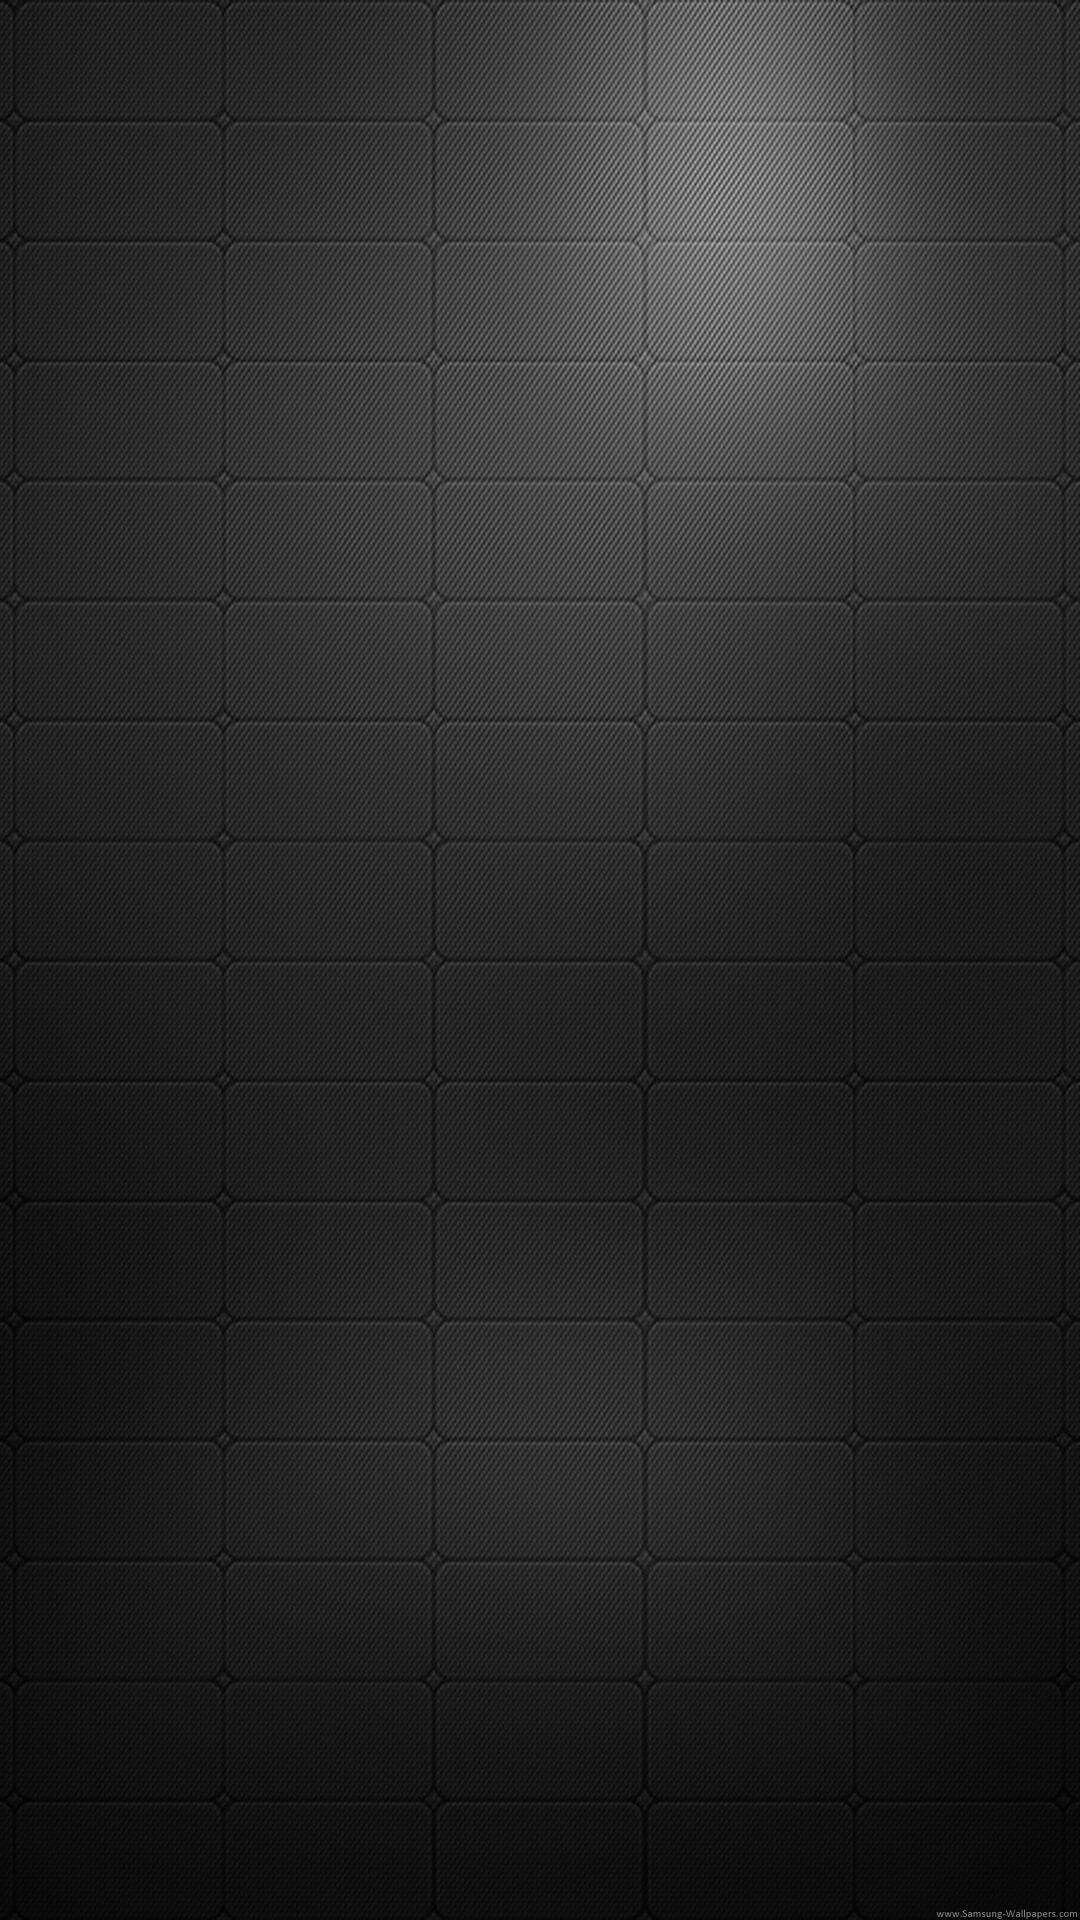 Wallpaper Black Screen Picture In 2020 Black Screen Samsung